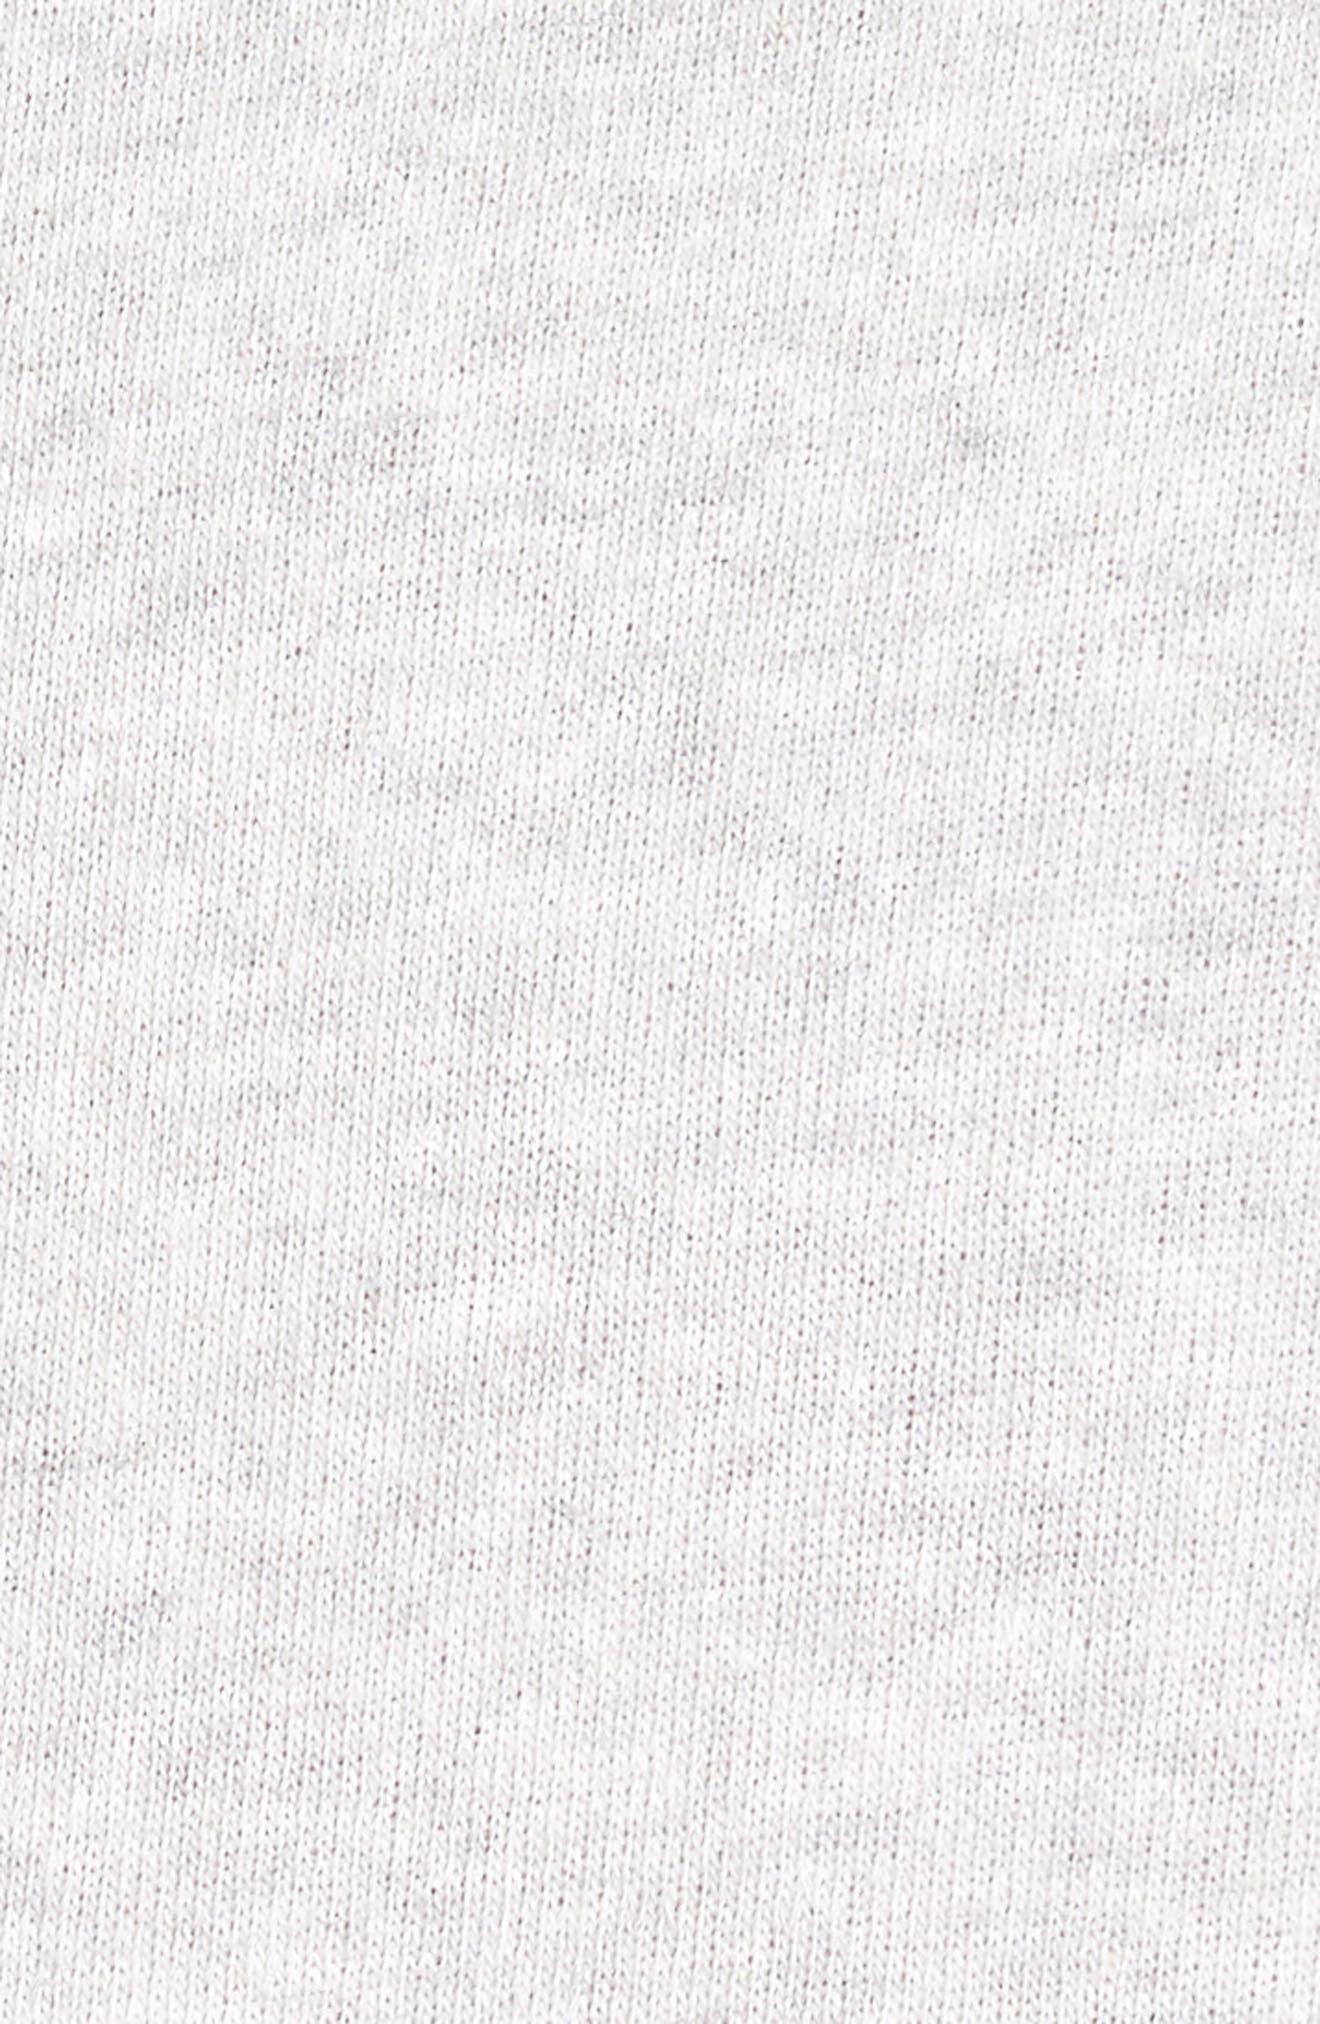 'The Champ' Sweatshirt,                             Alternate thumbnail 63, color,